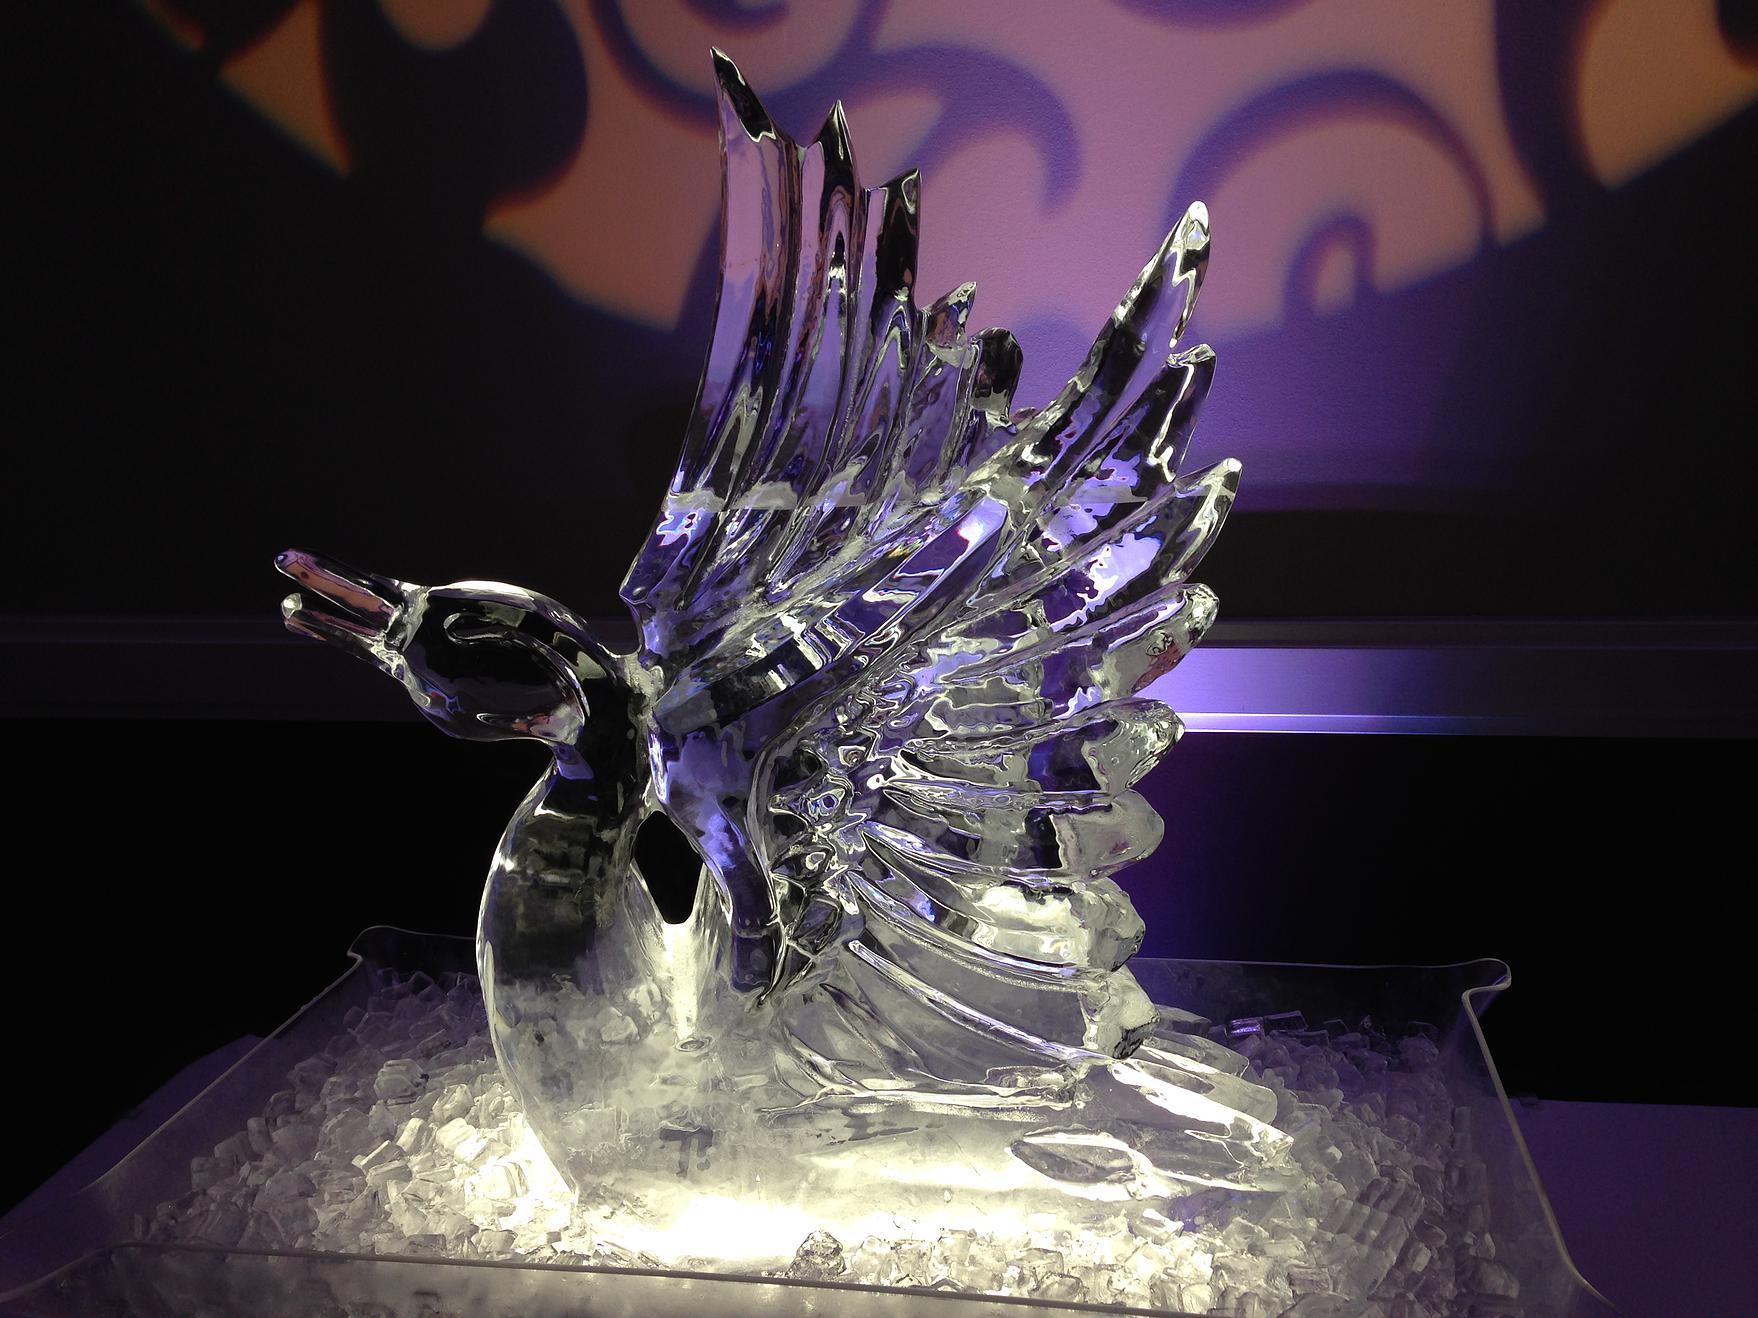 Goose ice sculpture